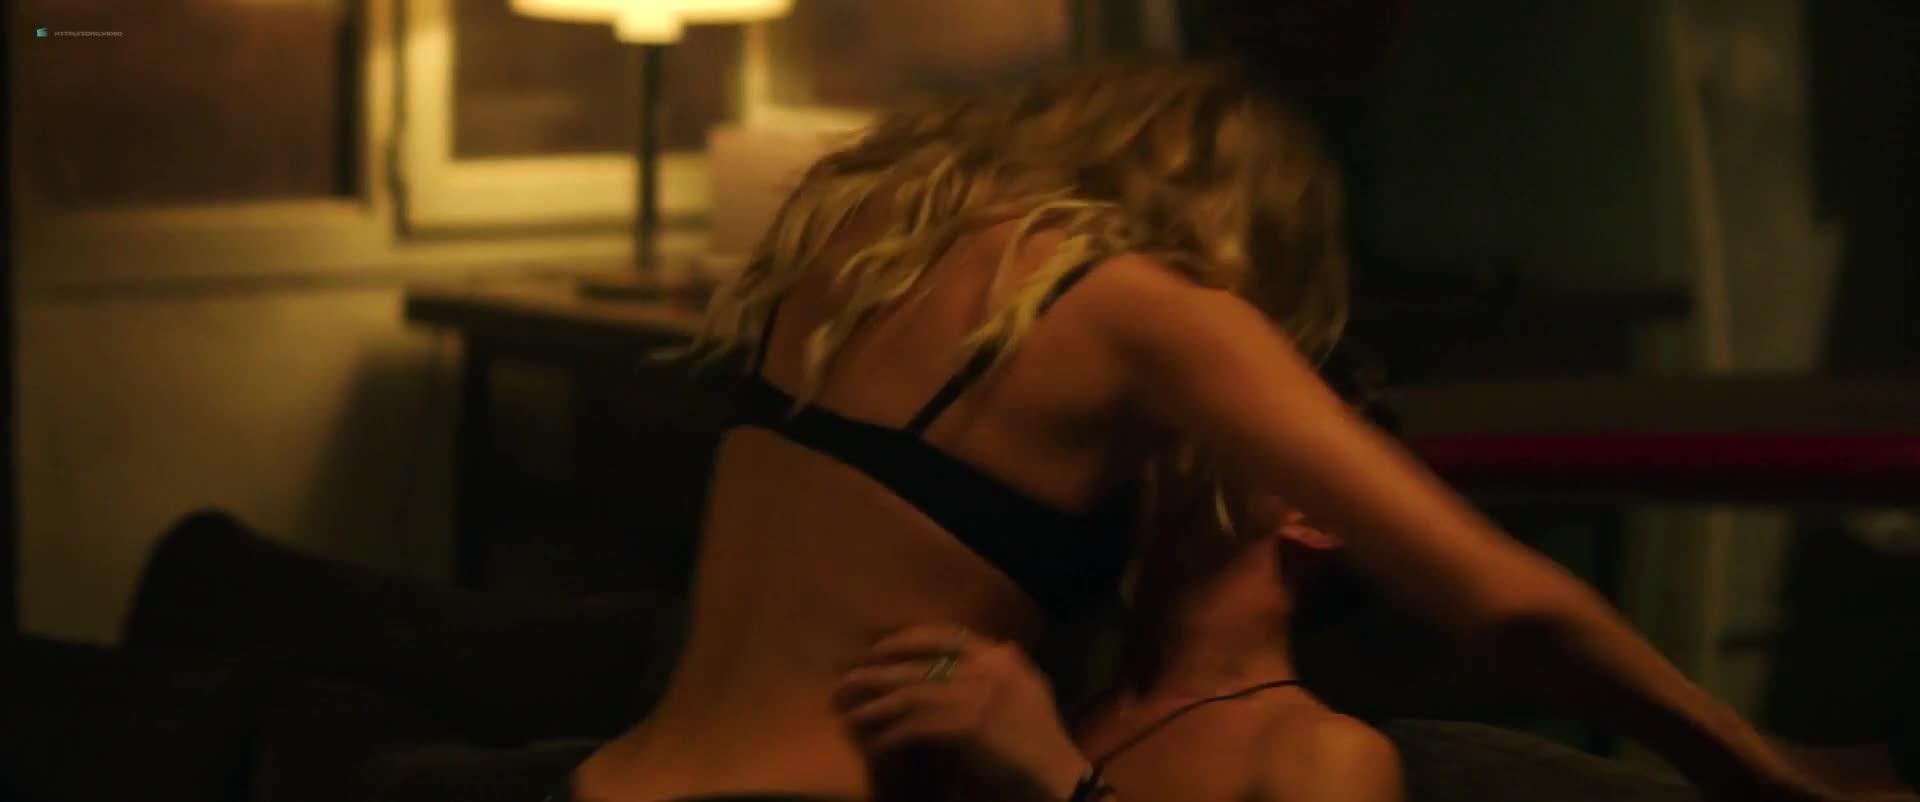 Gaia Weiss sexy scene - overdrive